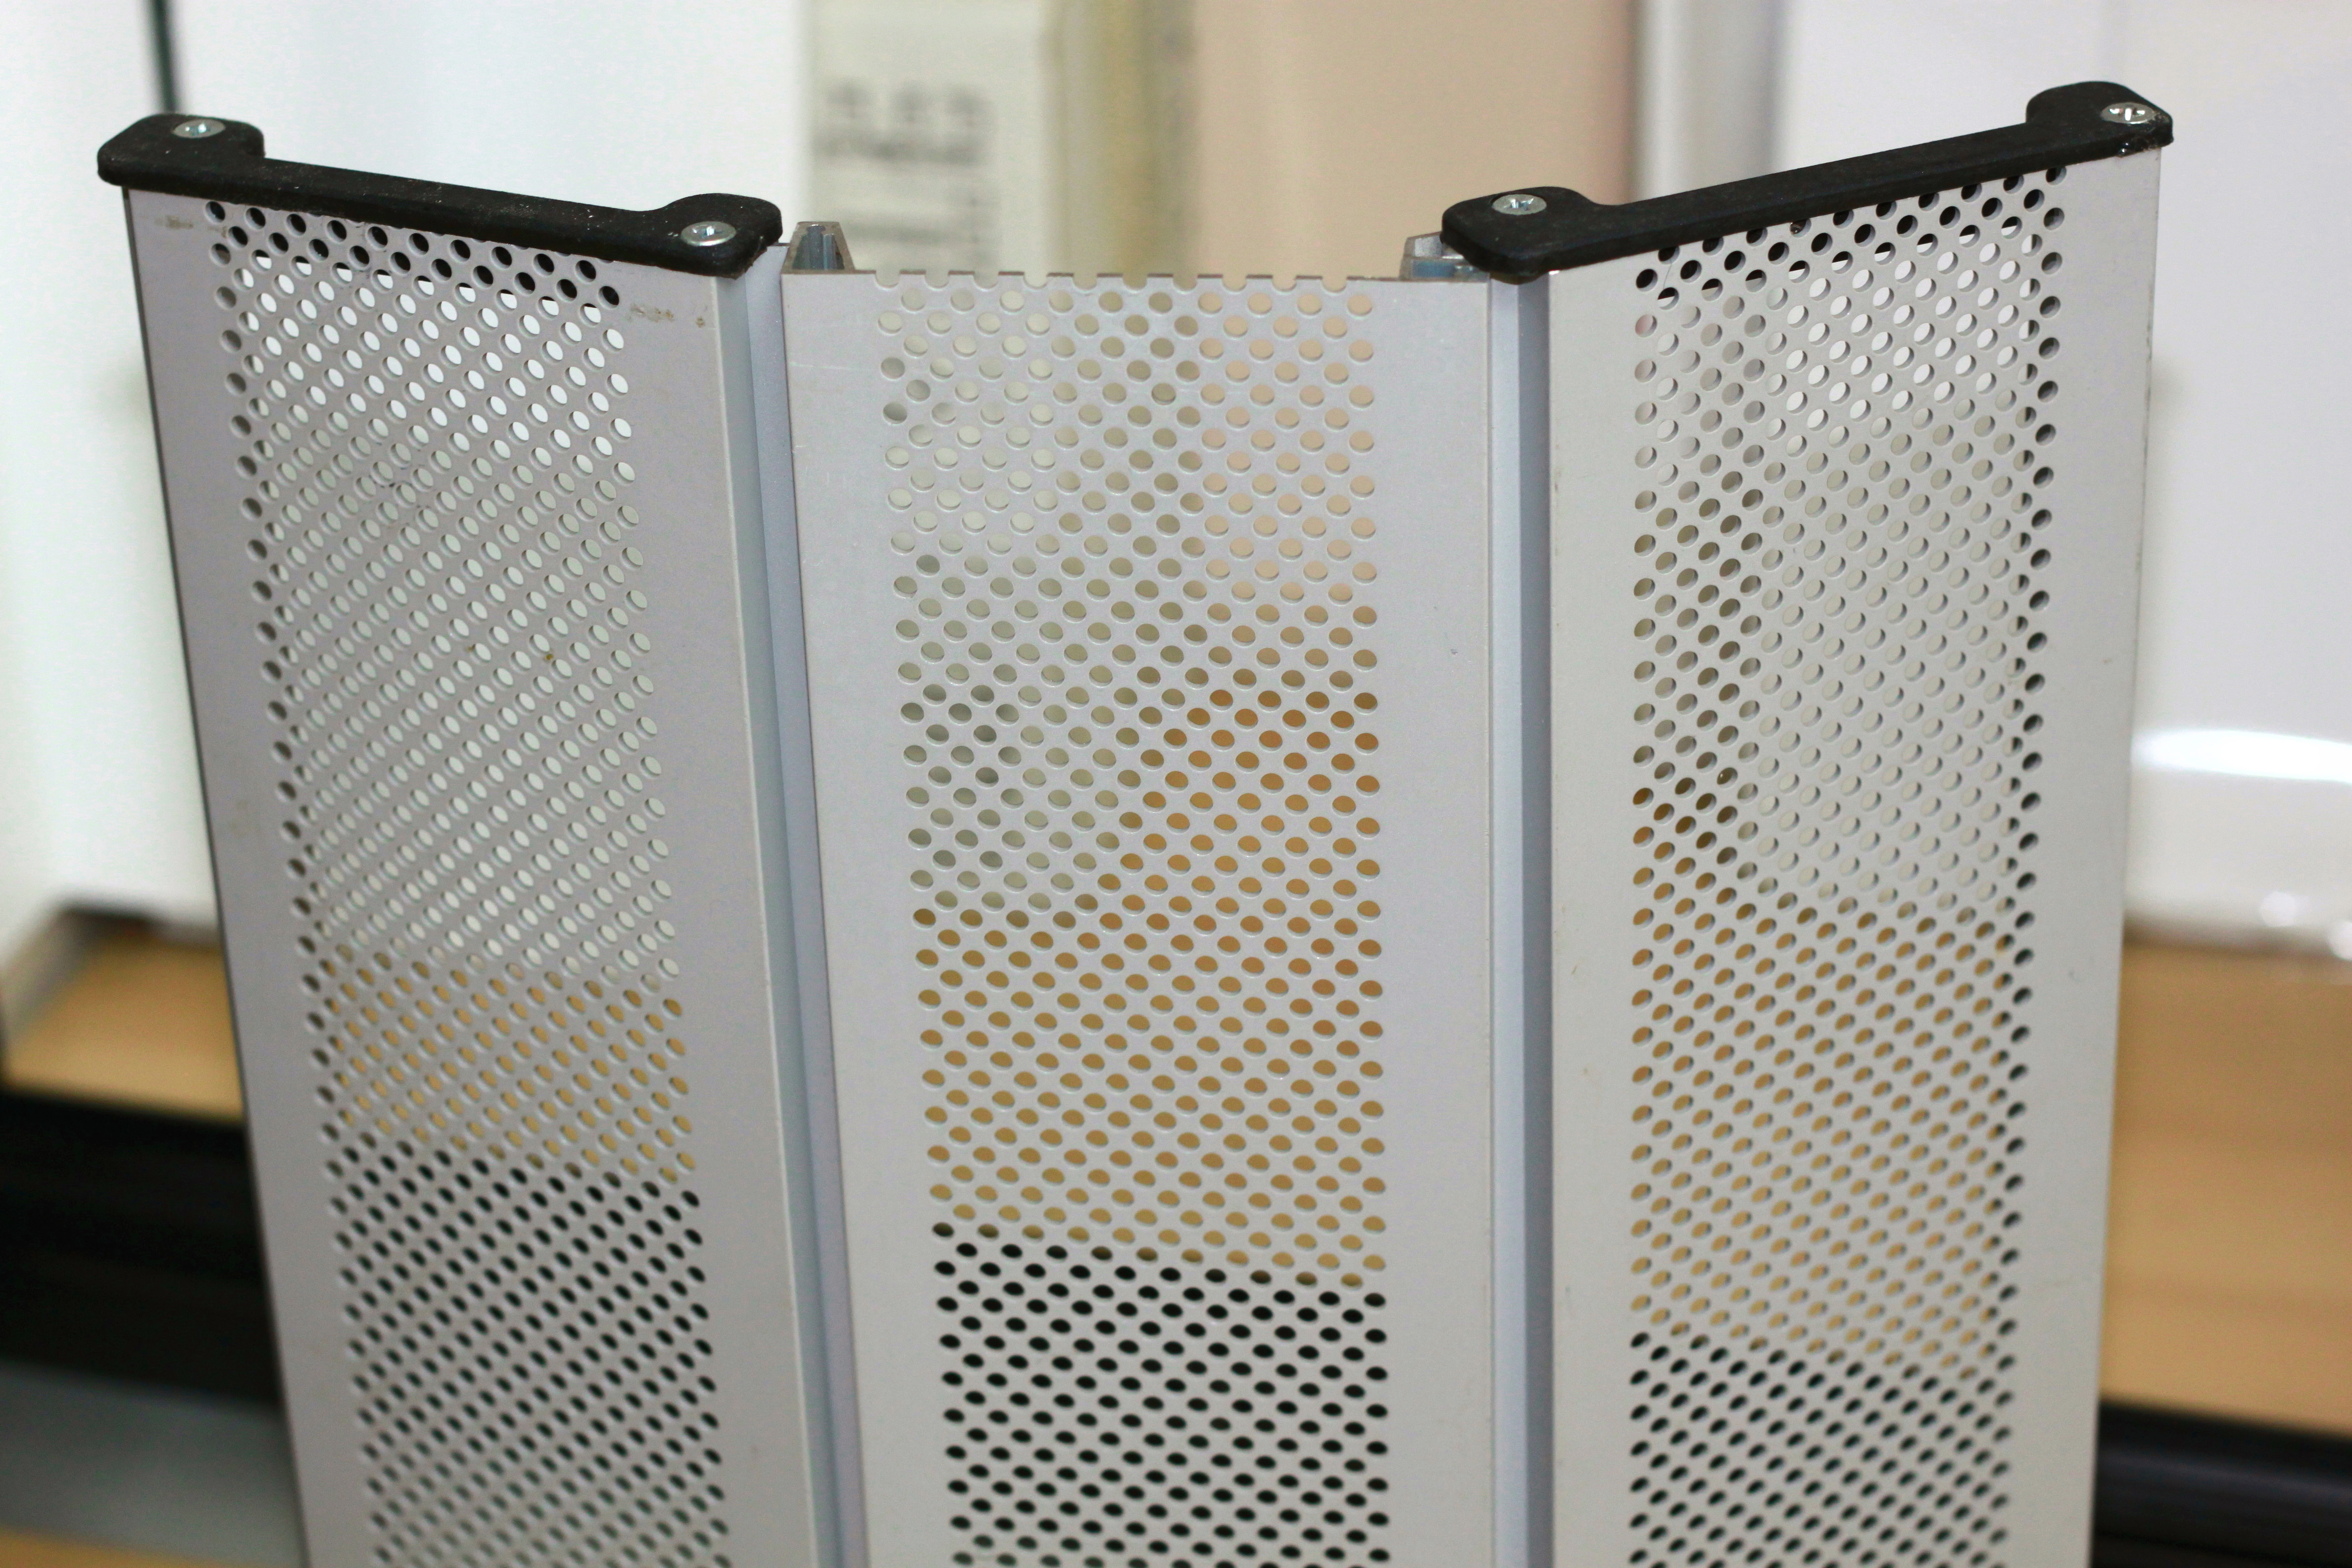 Fabricaci n venta e instalaci n de persianas en barcelona for Persiana de aluminio